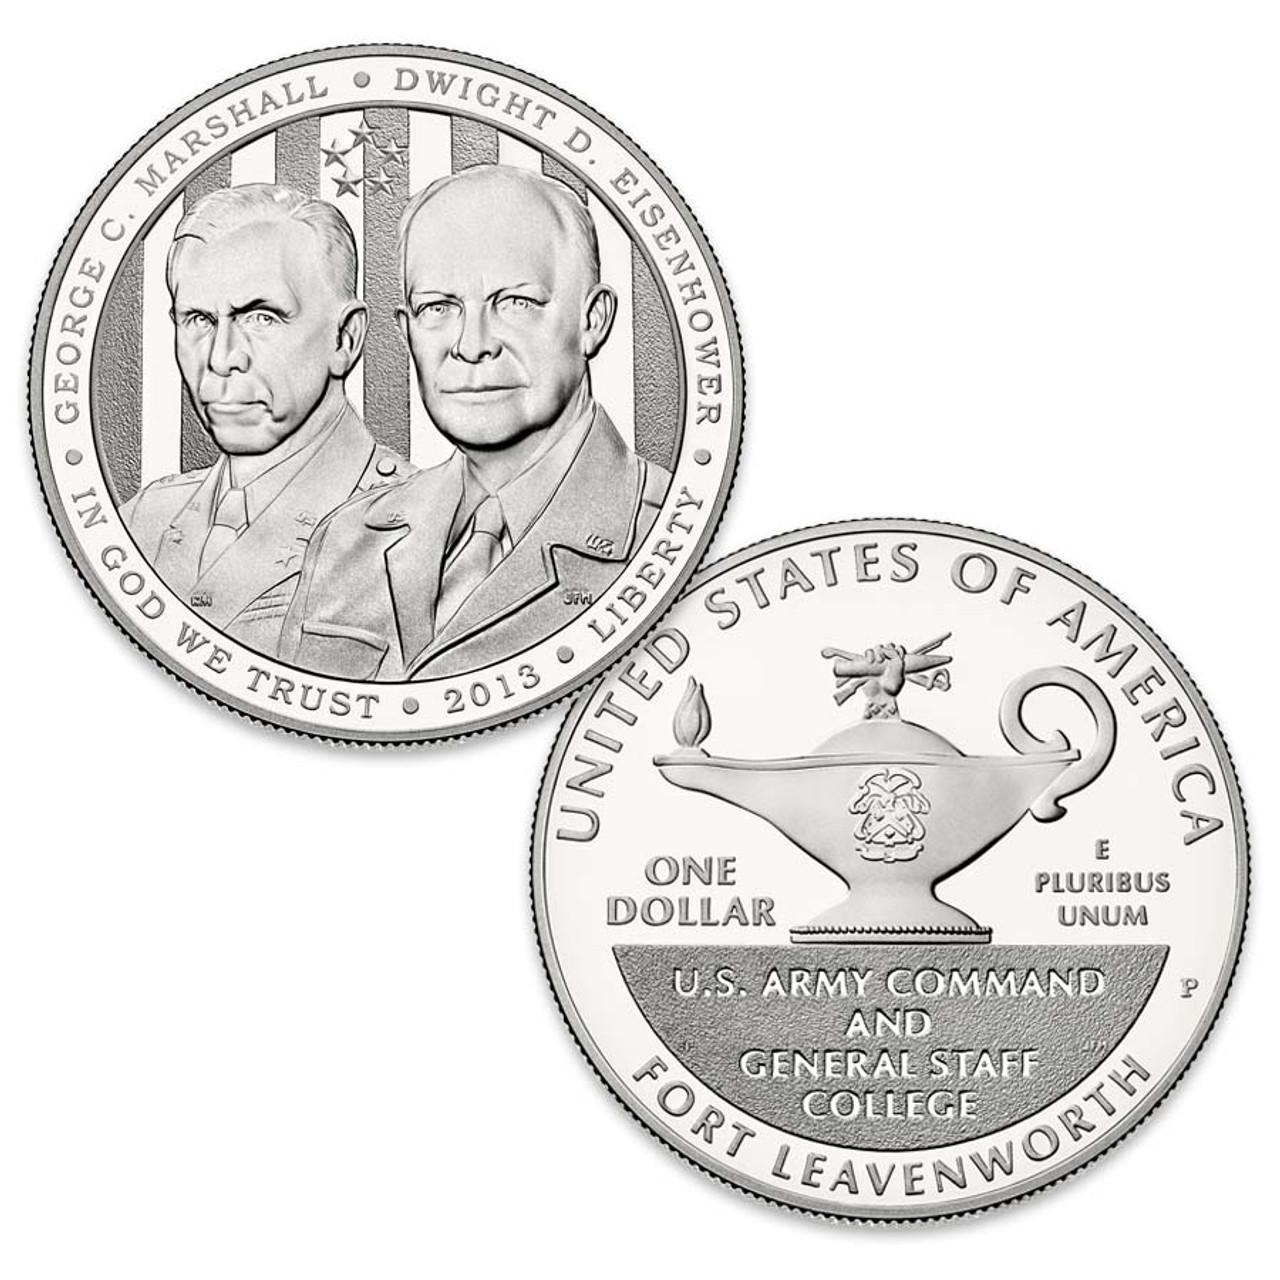 2013 Five-Star Generals Silver Dollar Proof